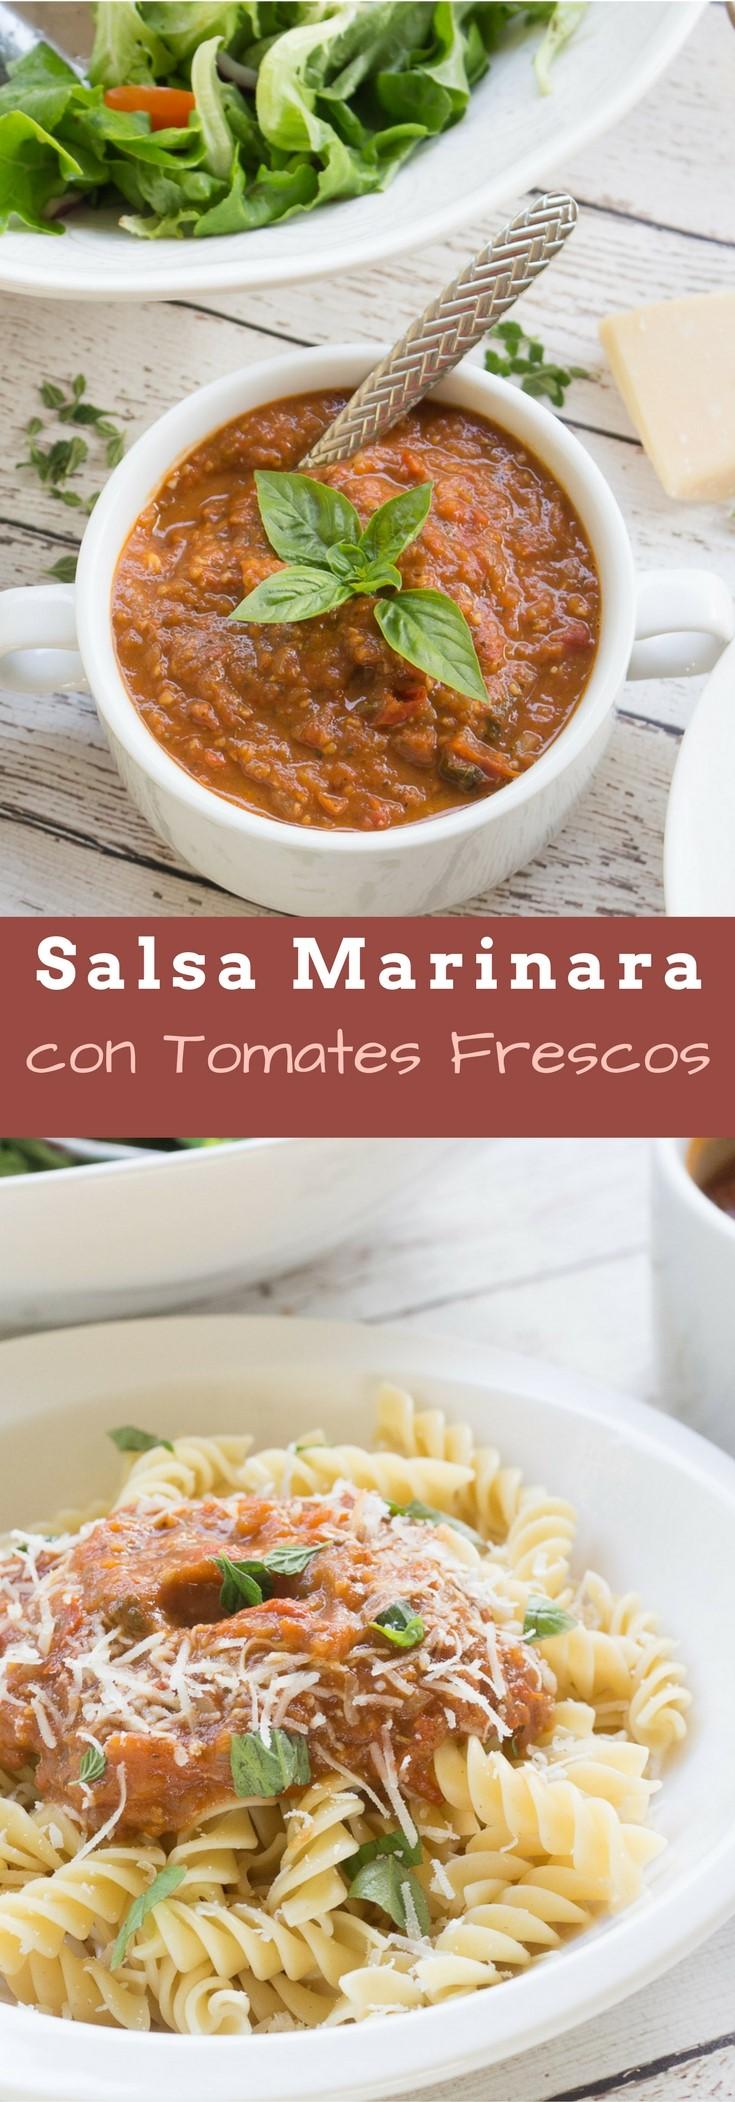 Salsa marinara con tomates frescos receta ensalpicadas for Hacer salsa marinera